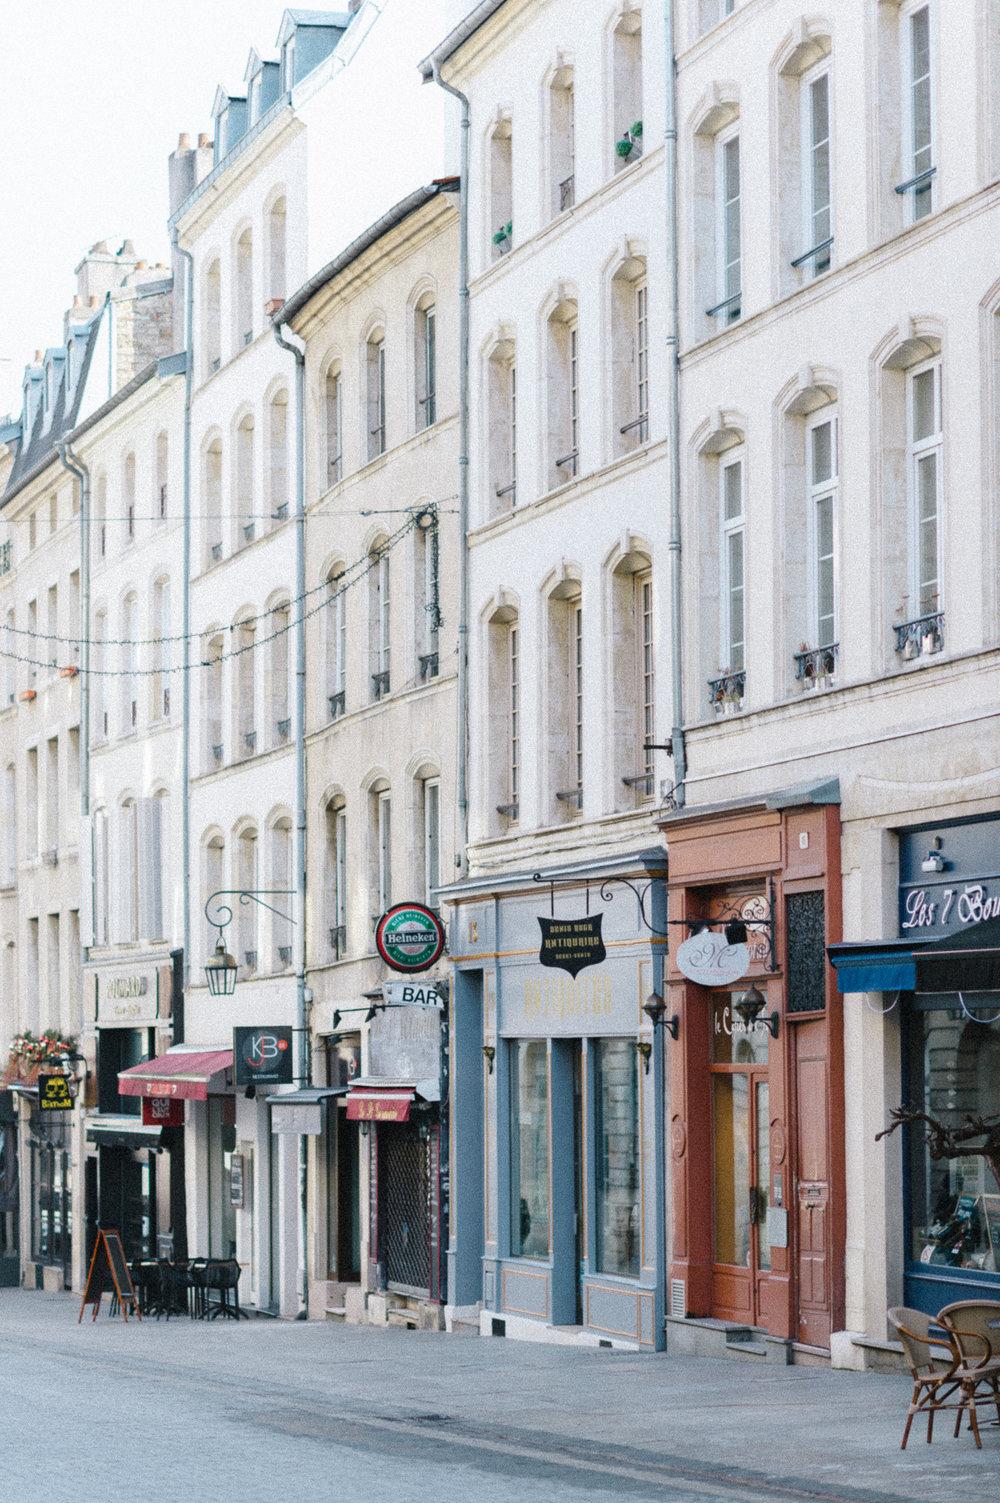 Nancy_France_2019_02.jpg